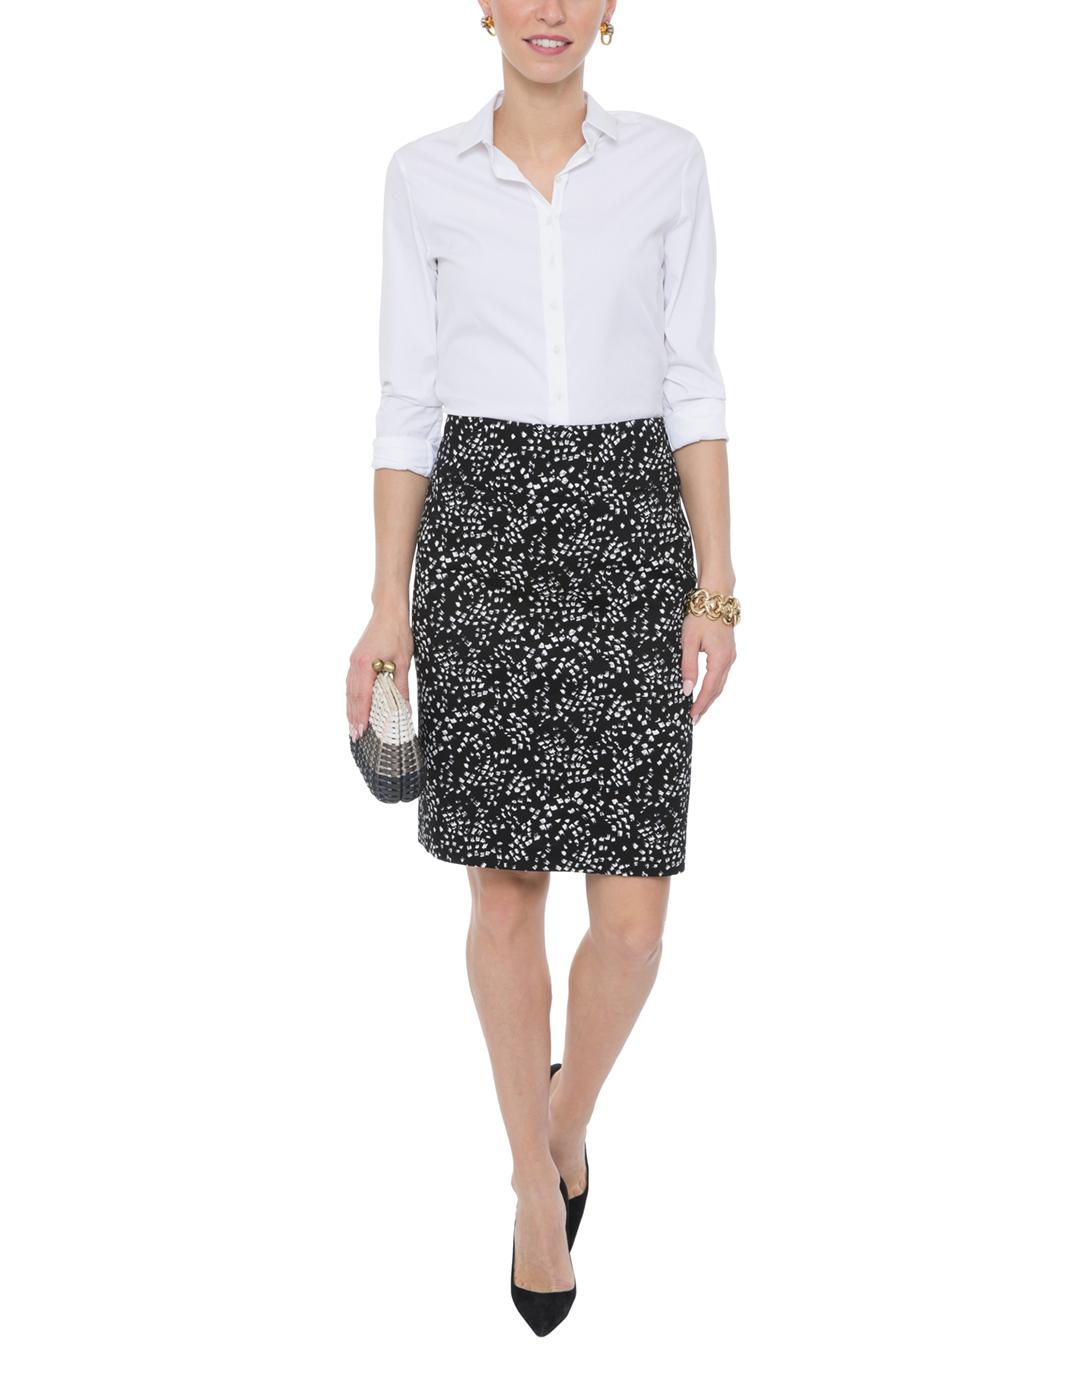 black and white confetti print stretch pencil skirt